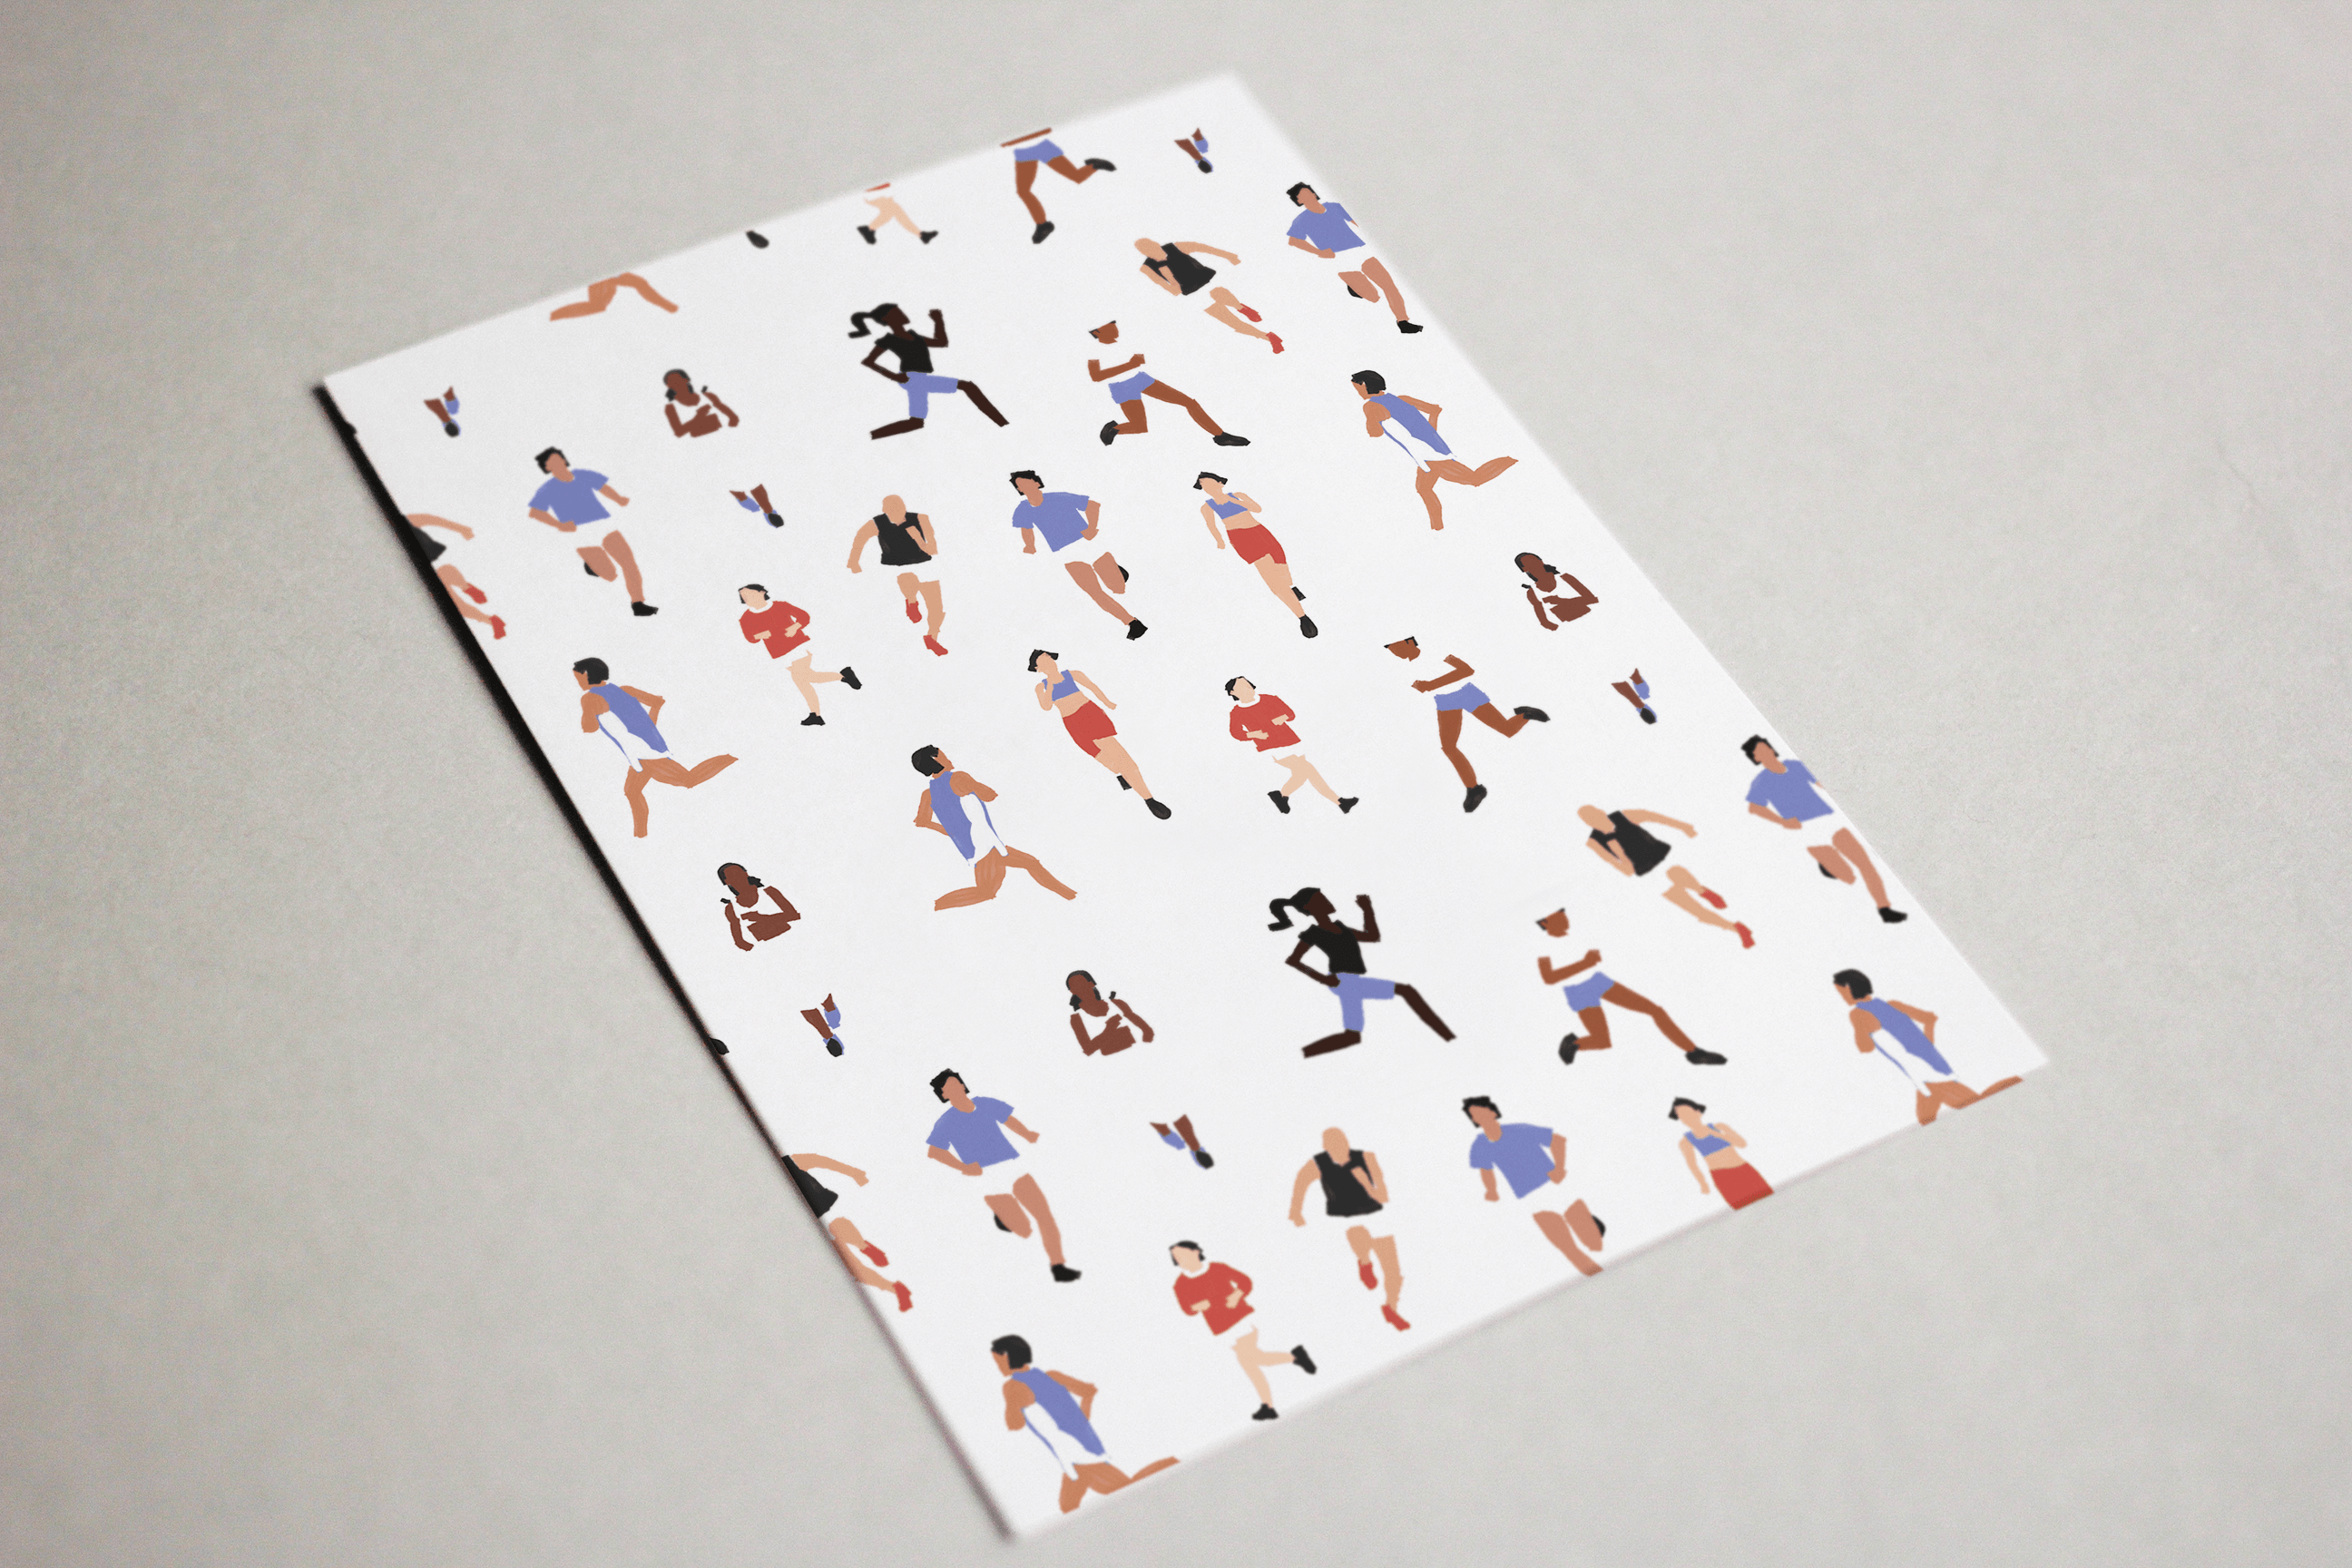 løbere_postkort_hvid